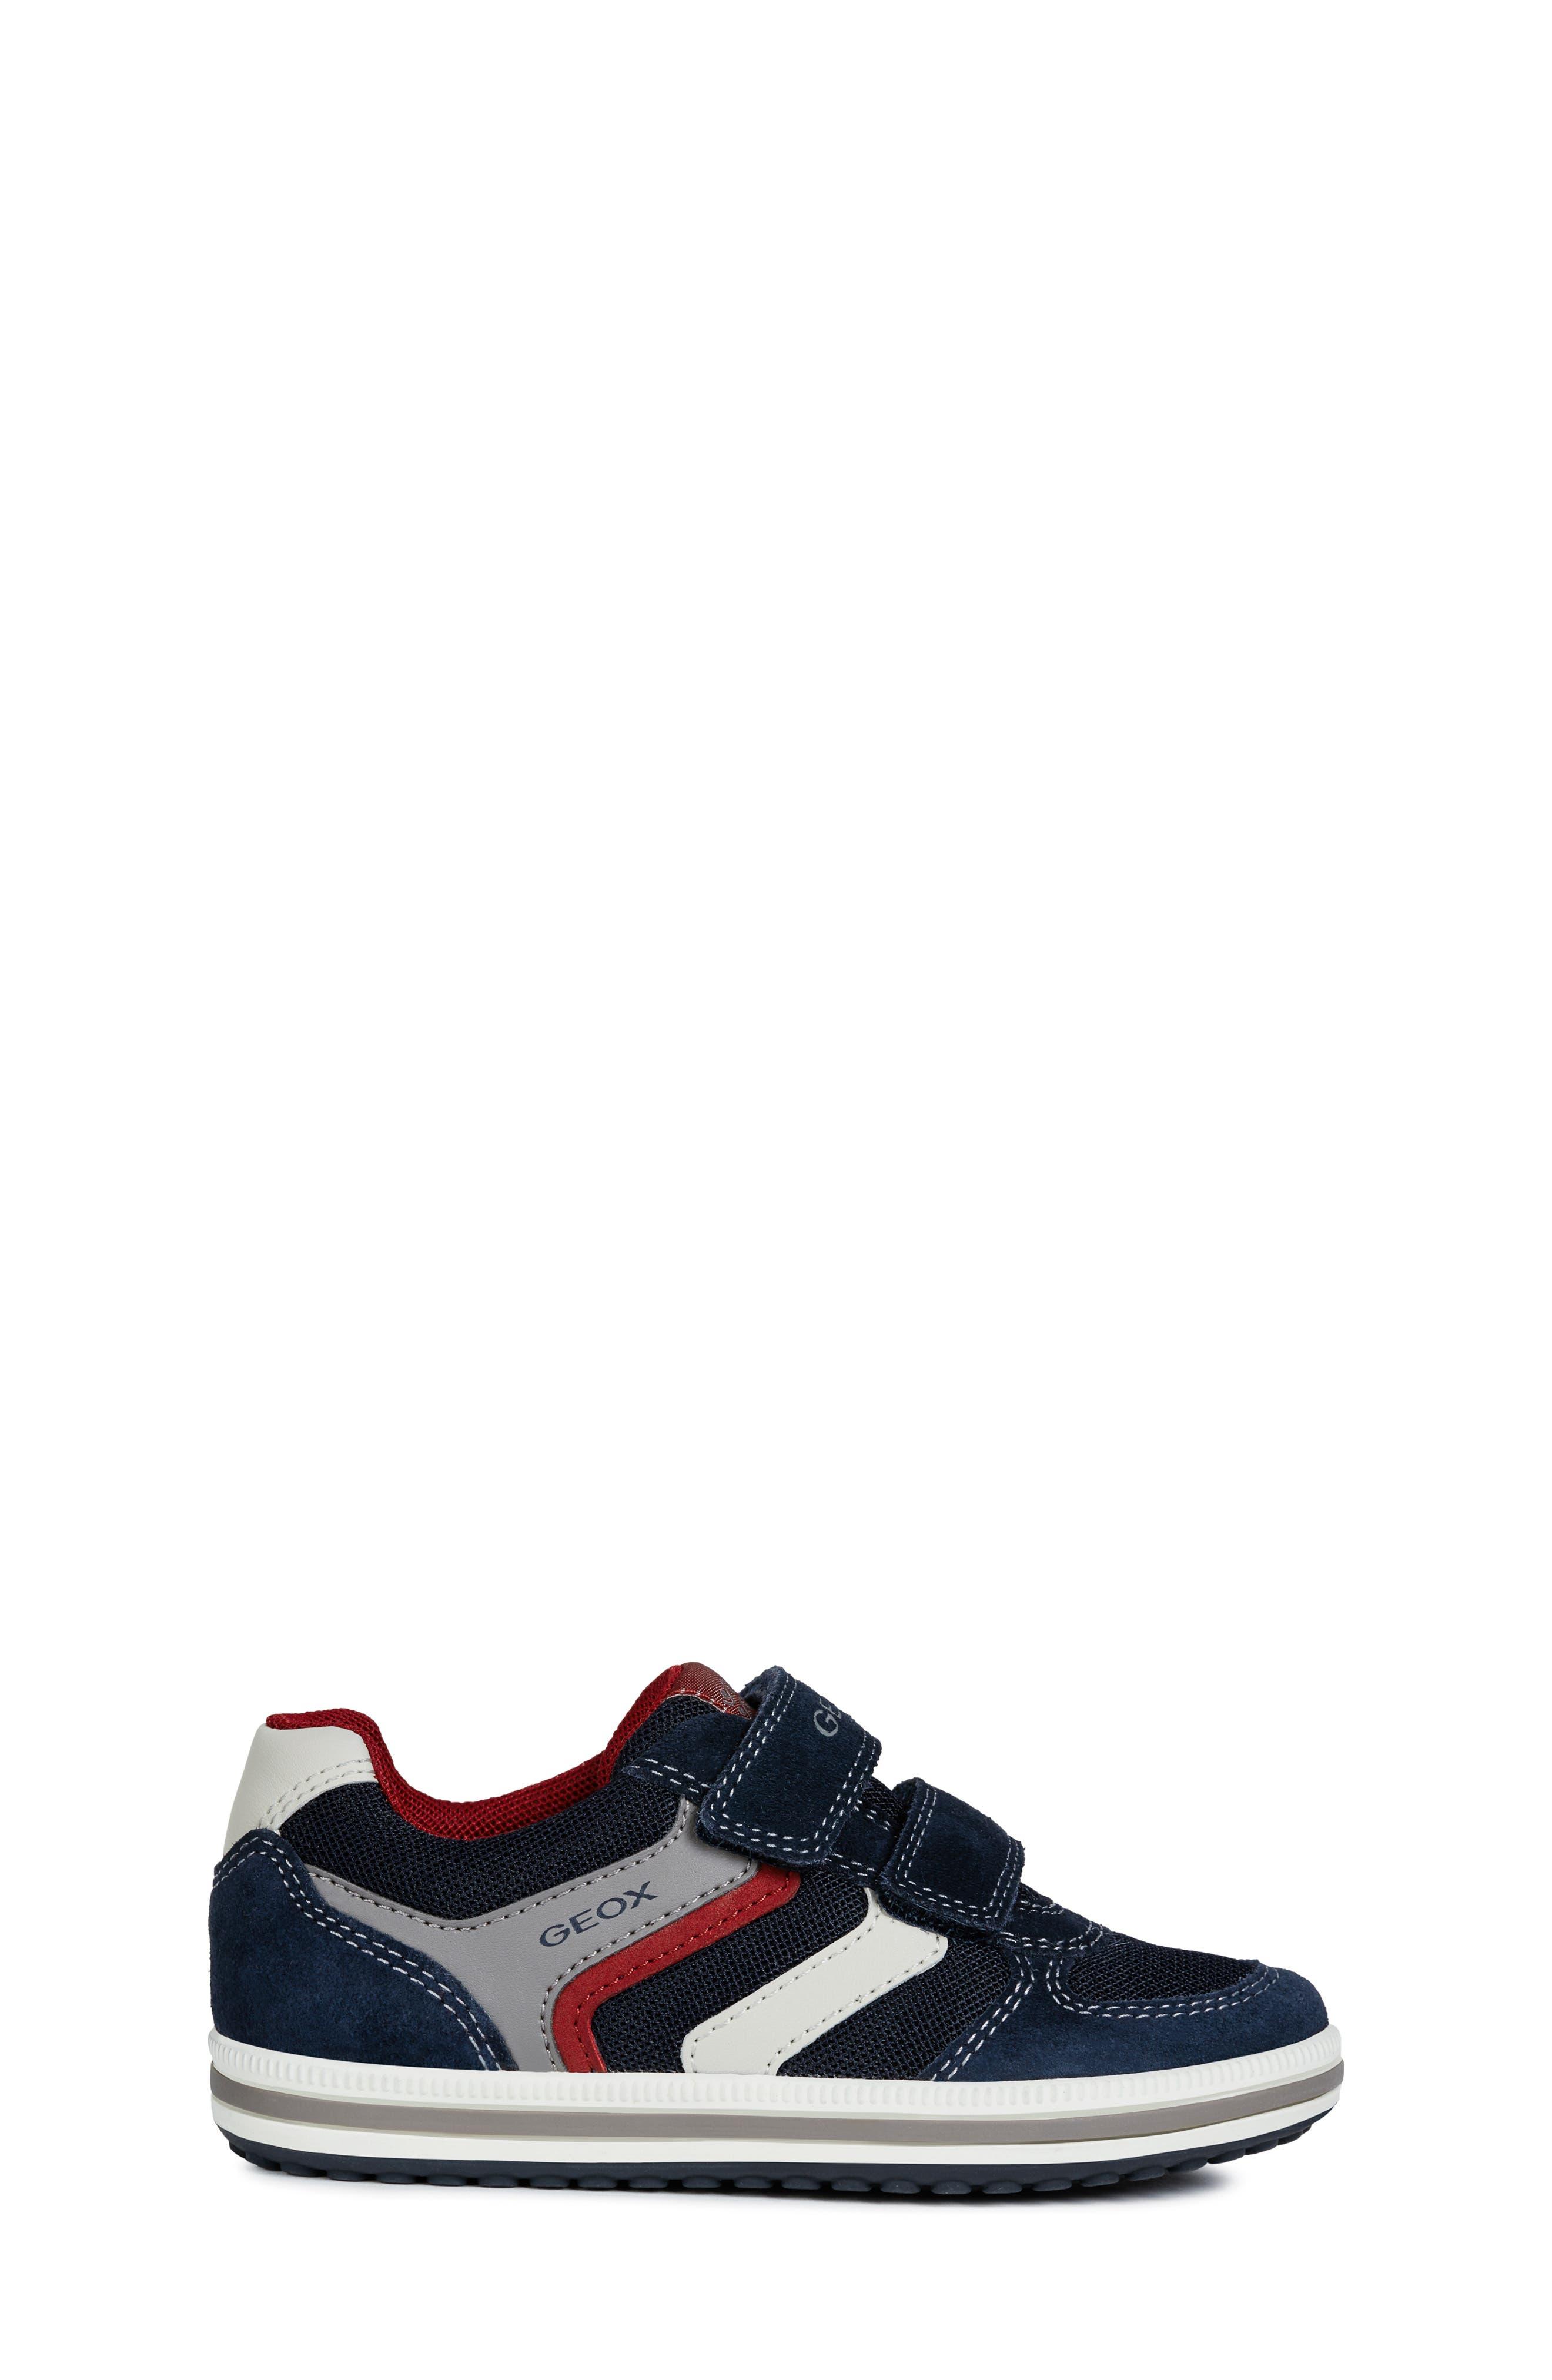 GEOX, 'Vita' Sneaker, Alternate thumbnail 3, color, NAVY/ RED